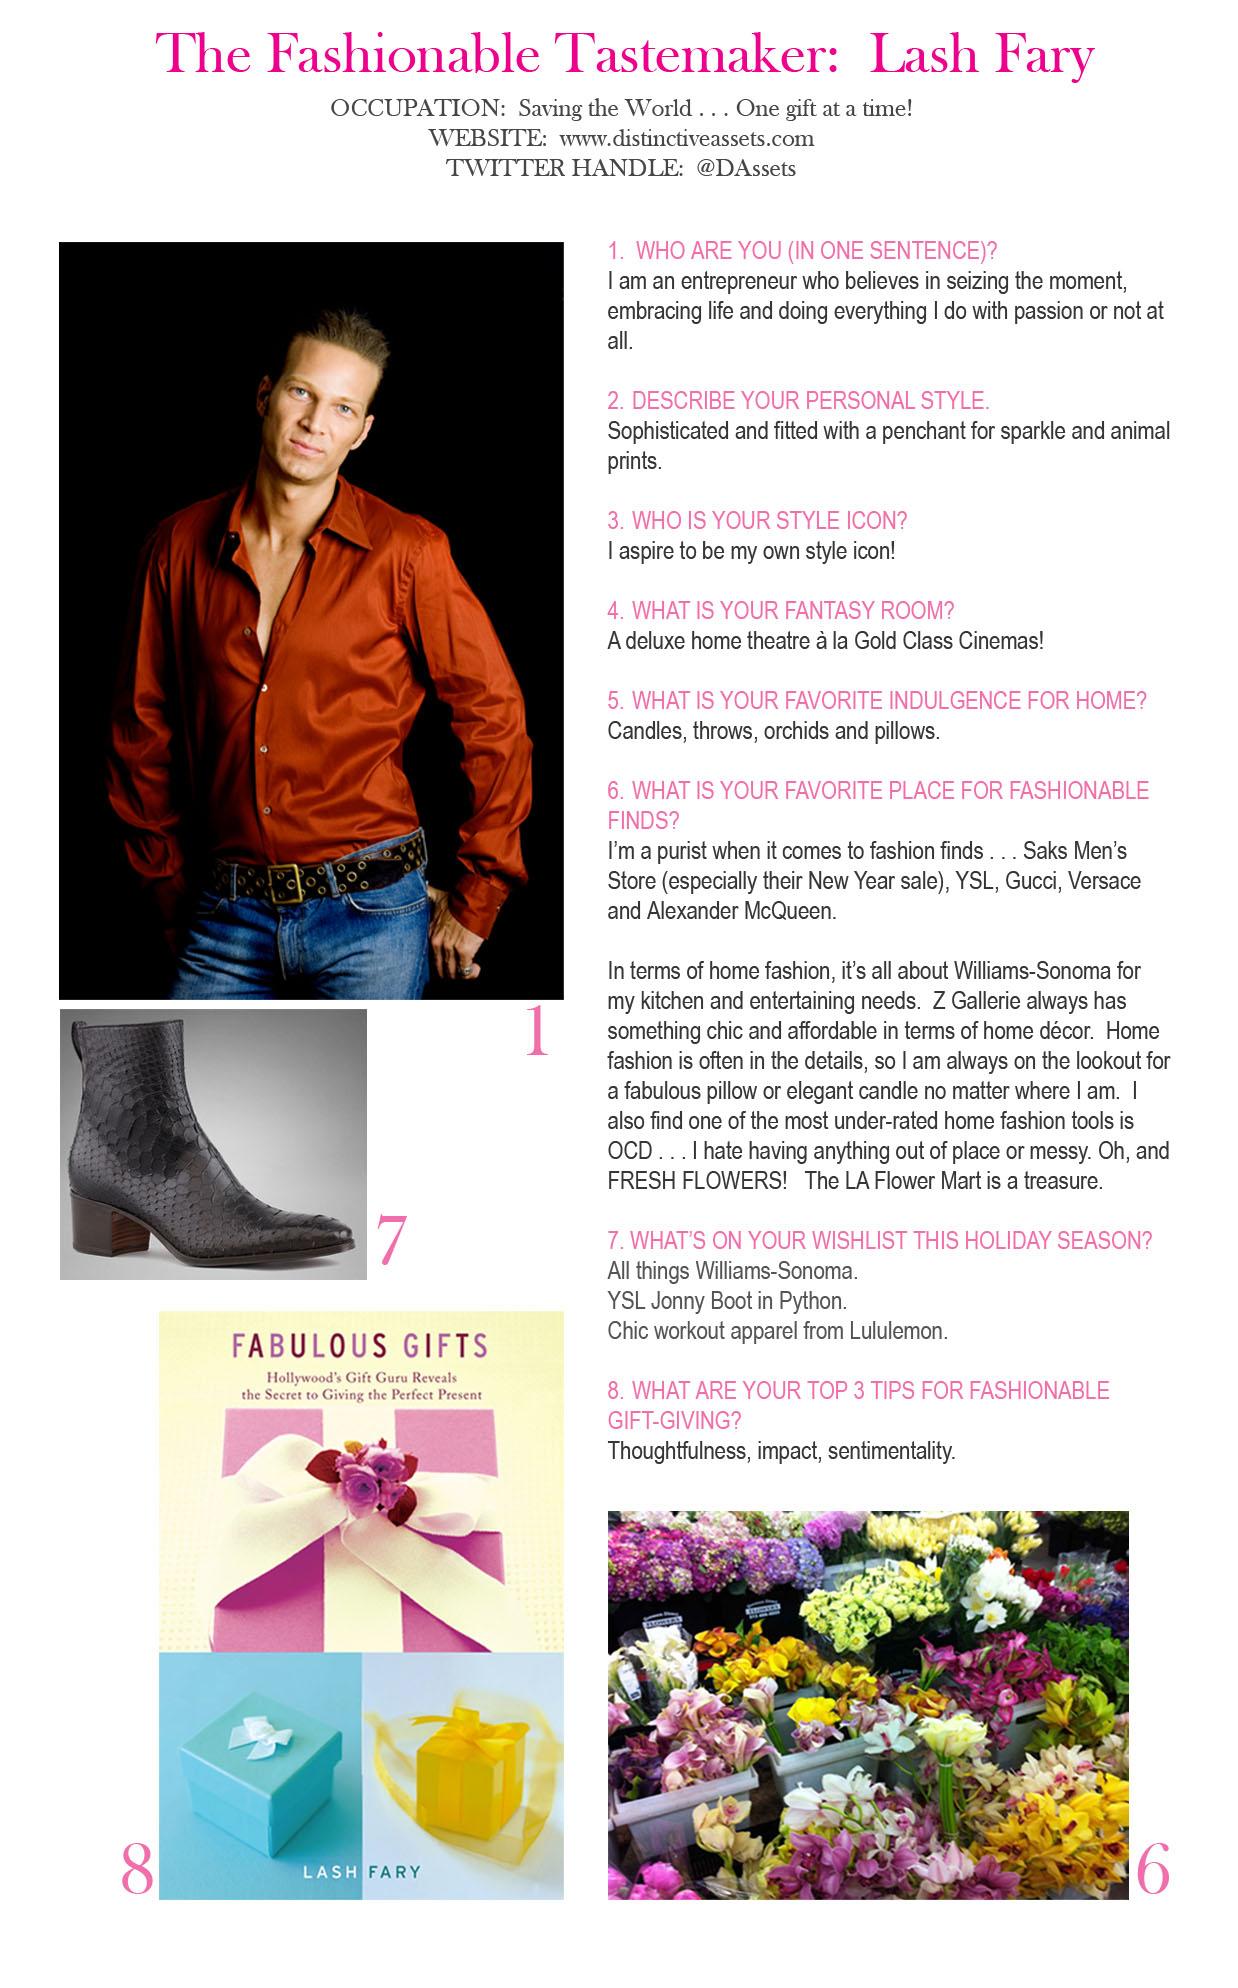 The Fashionable Tastemaker: Lash Fary